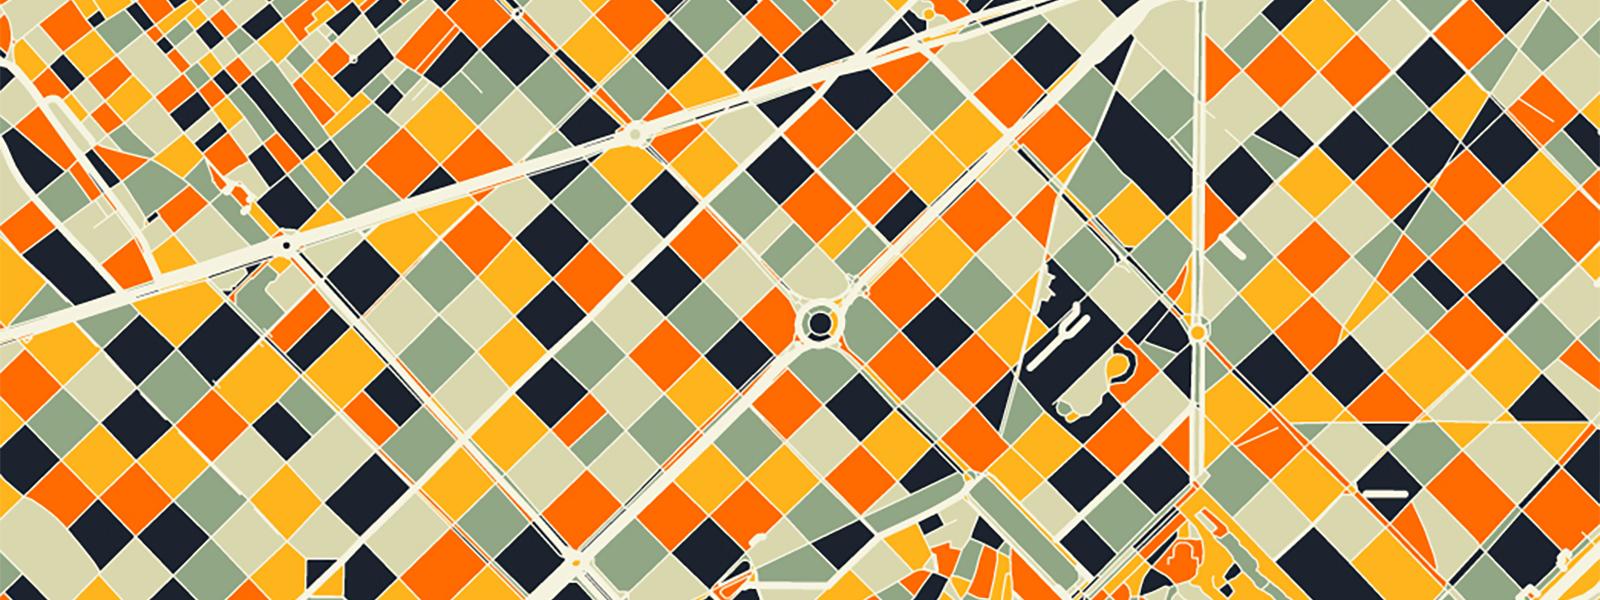 Slider 6 - Guillaume Sciaux - Cartographe professionnel